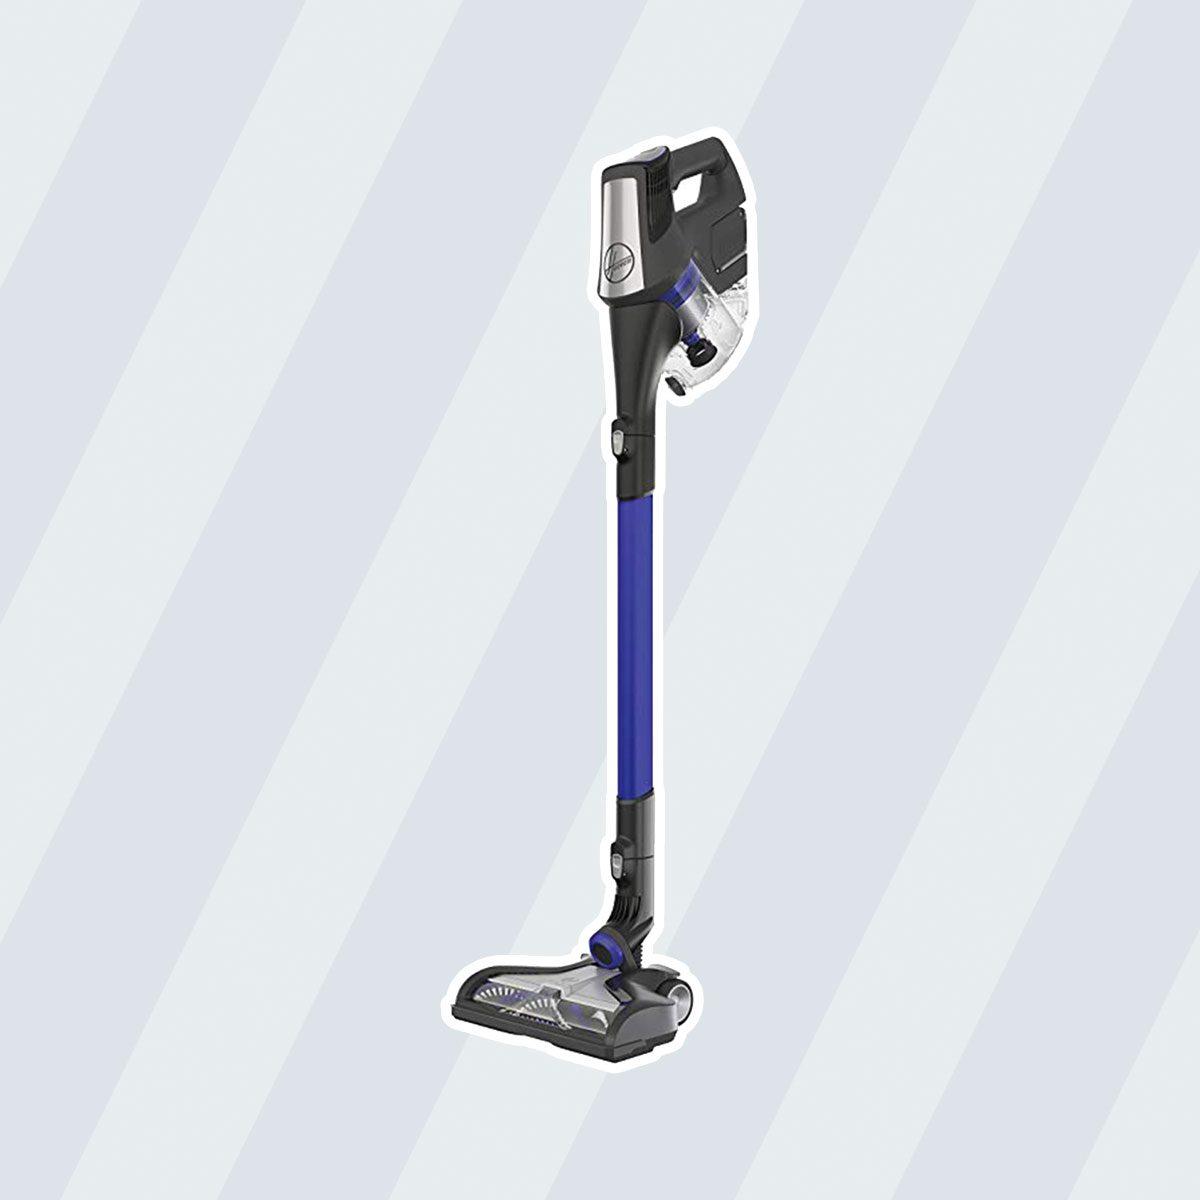 Hoover Fusion Pet V2 Cordless Stick Vacuum